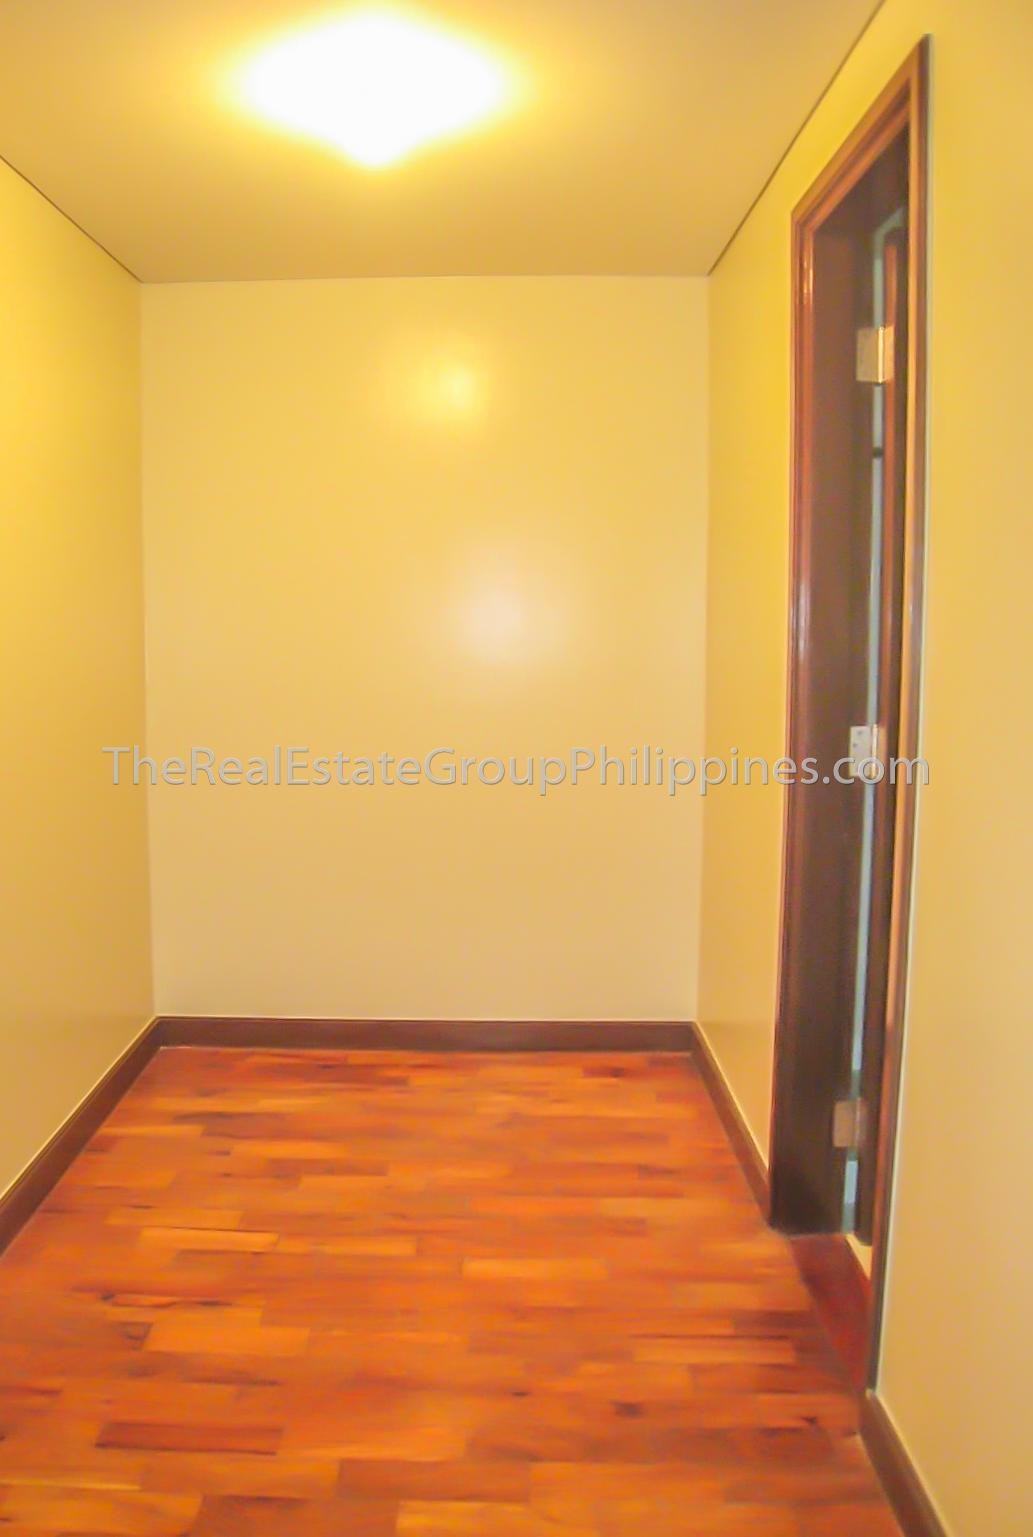 2BR Condo For Rent TRAG Laguna Tower Makati-150k (2 of 9)